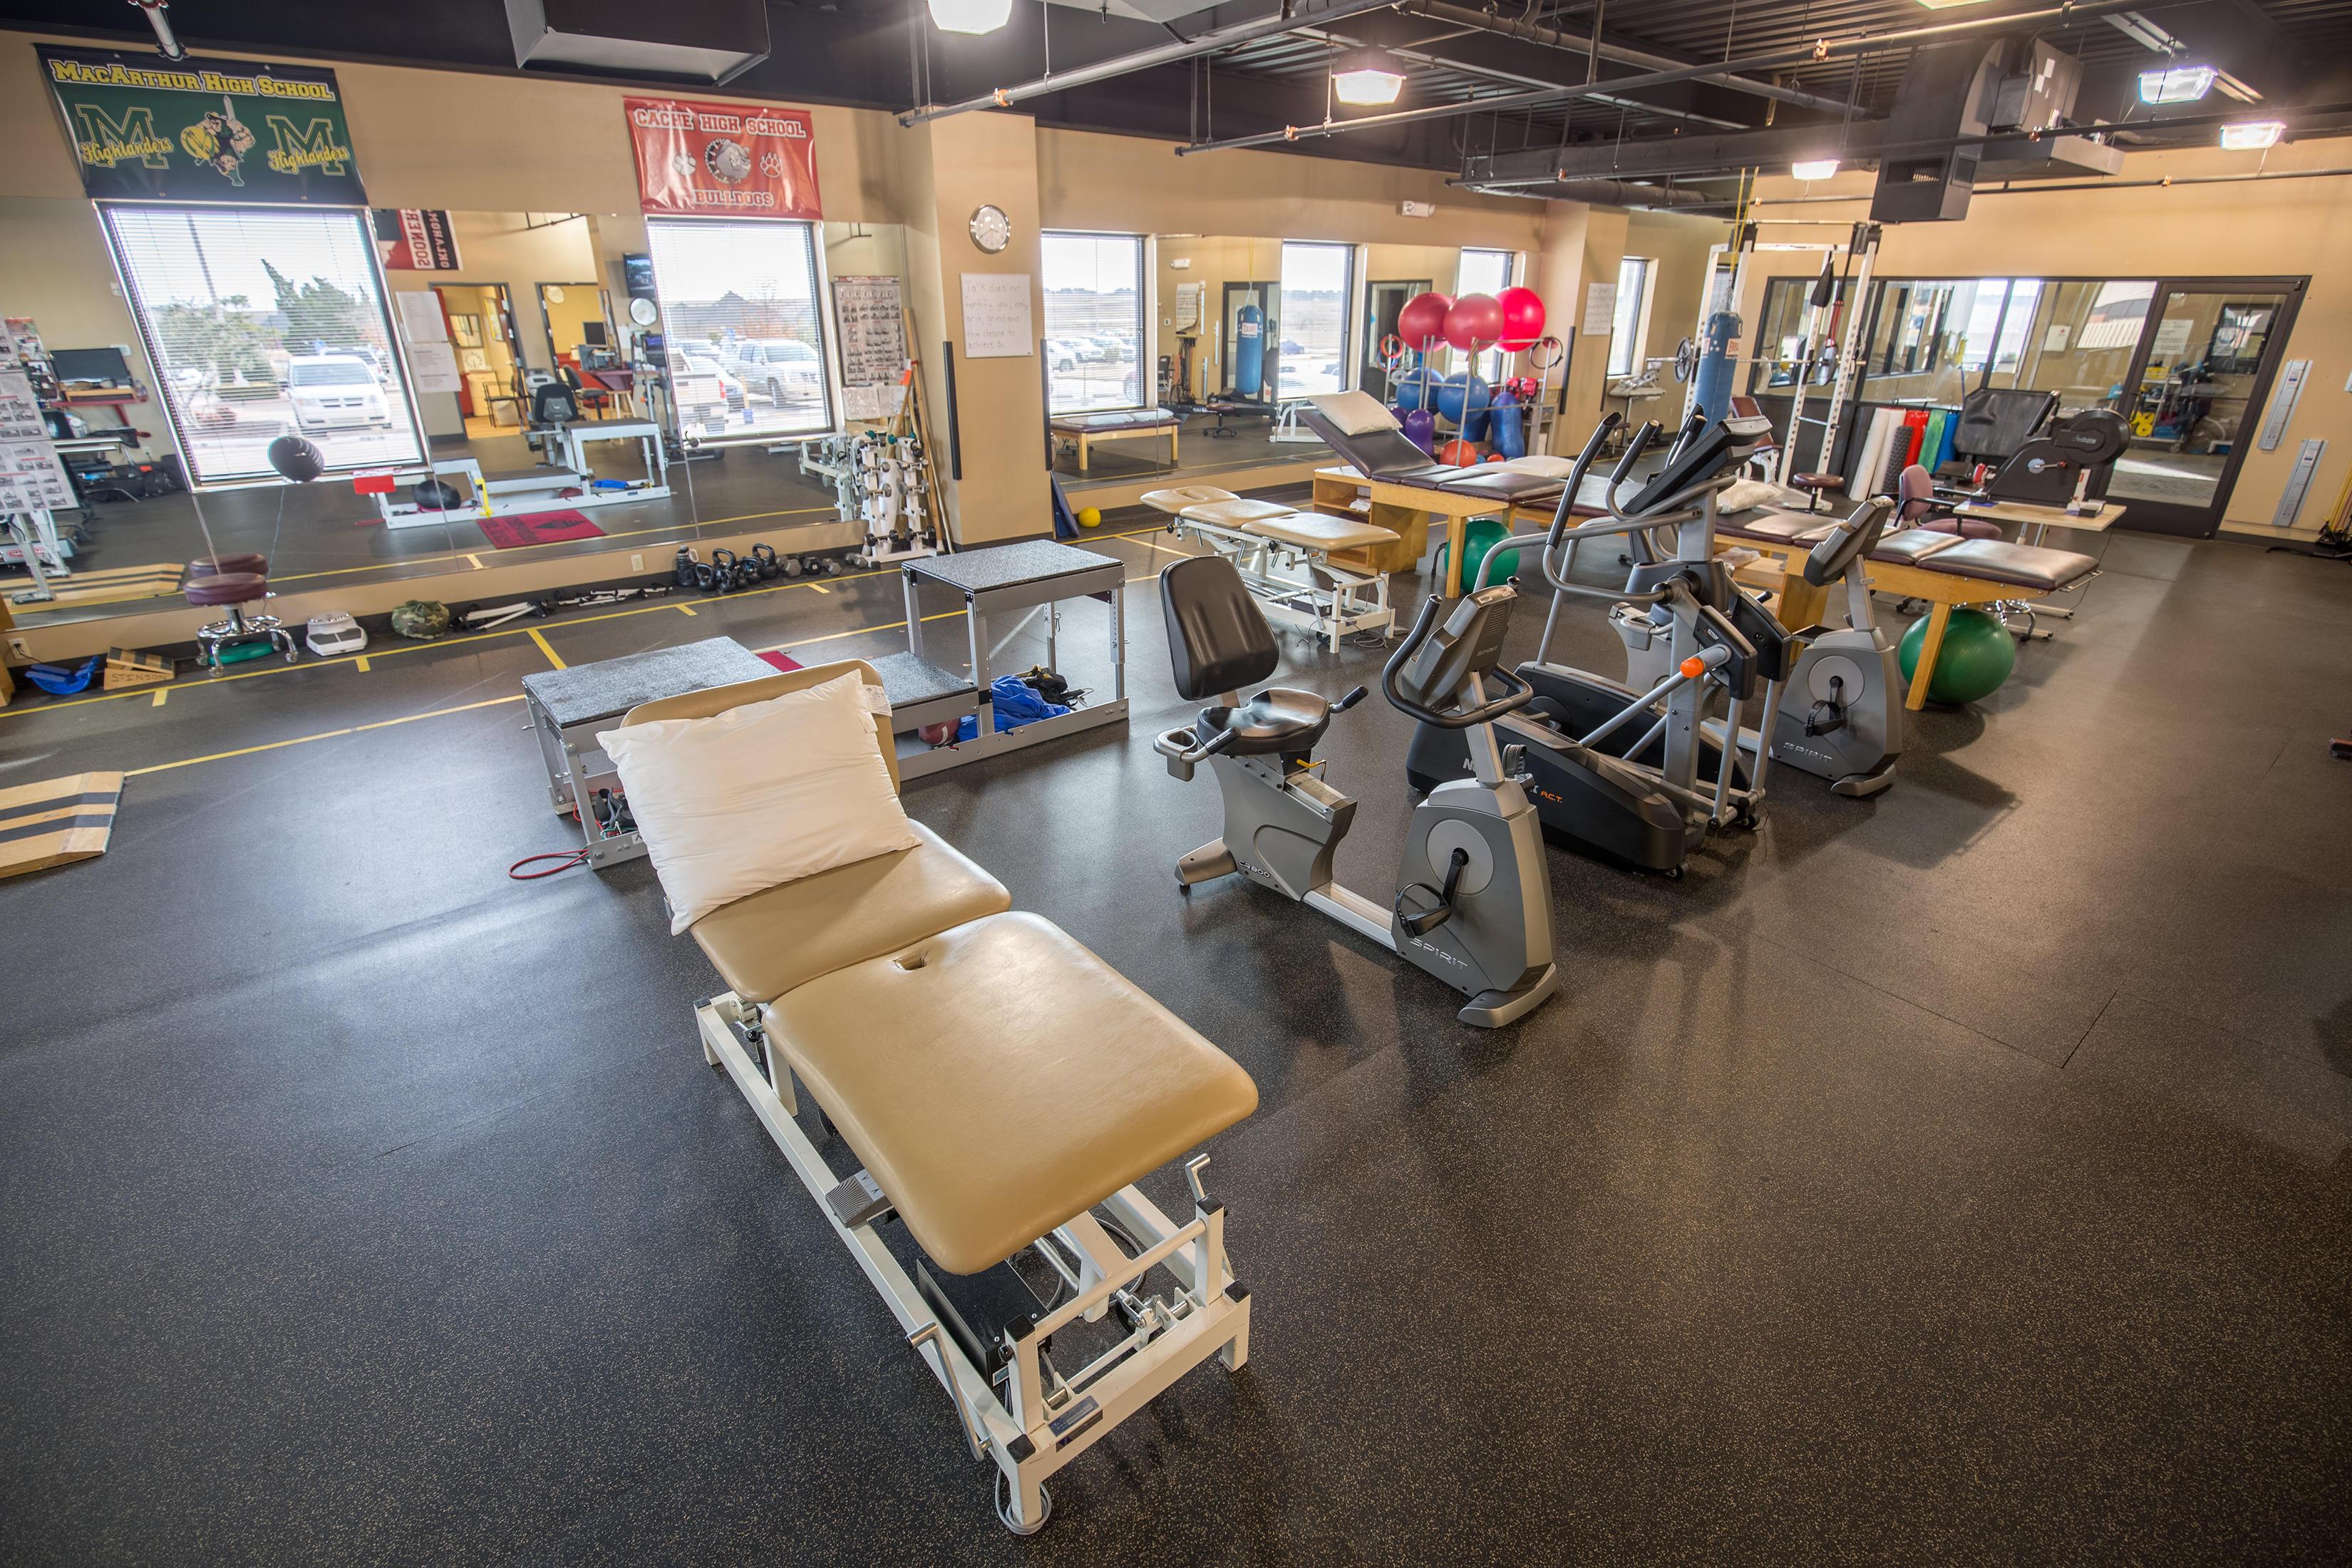 Center for Sports & Rehabilitation at Southwestern